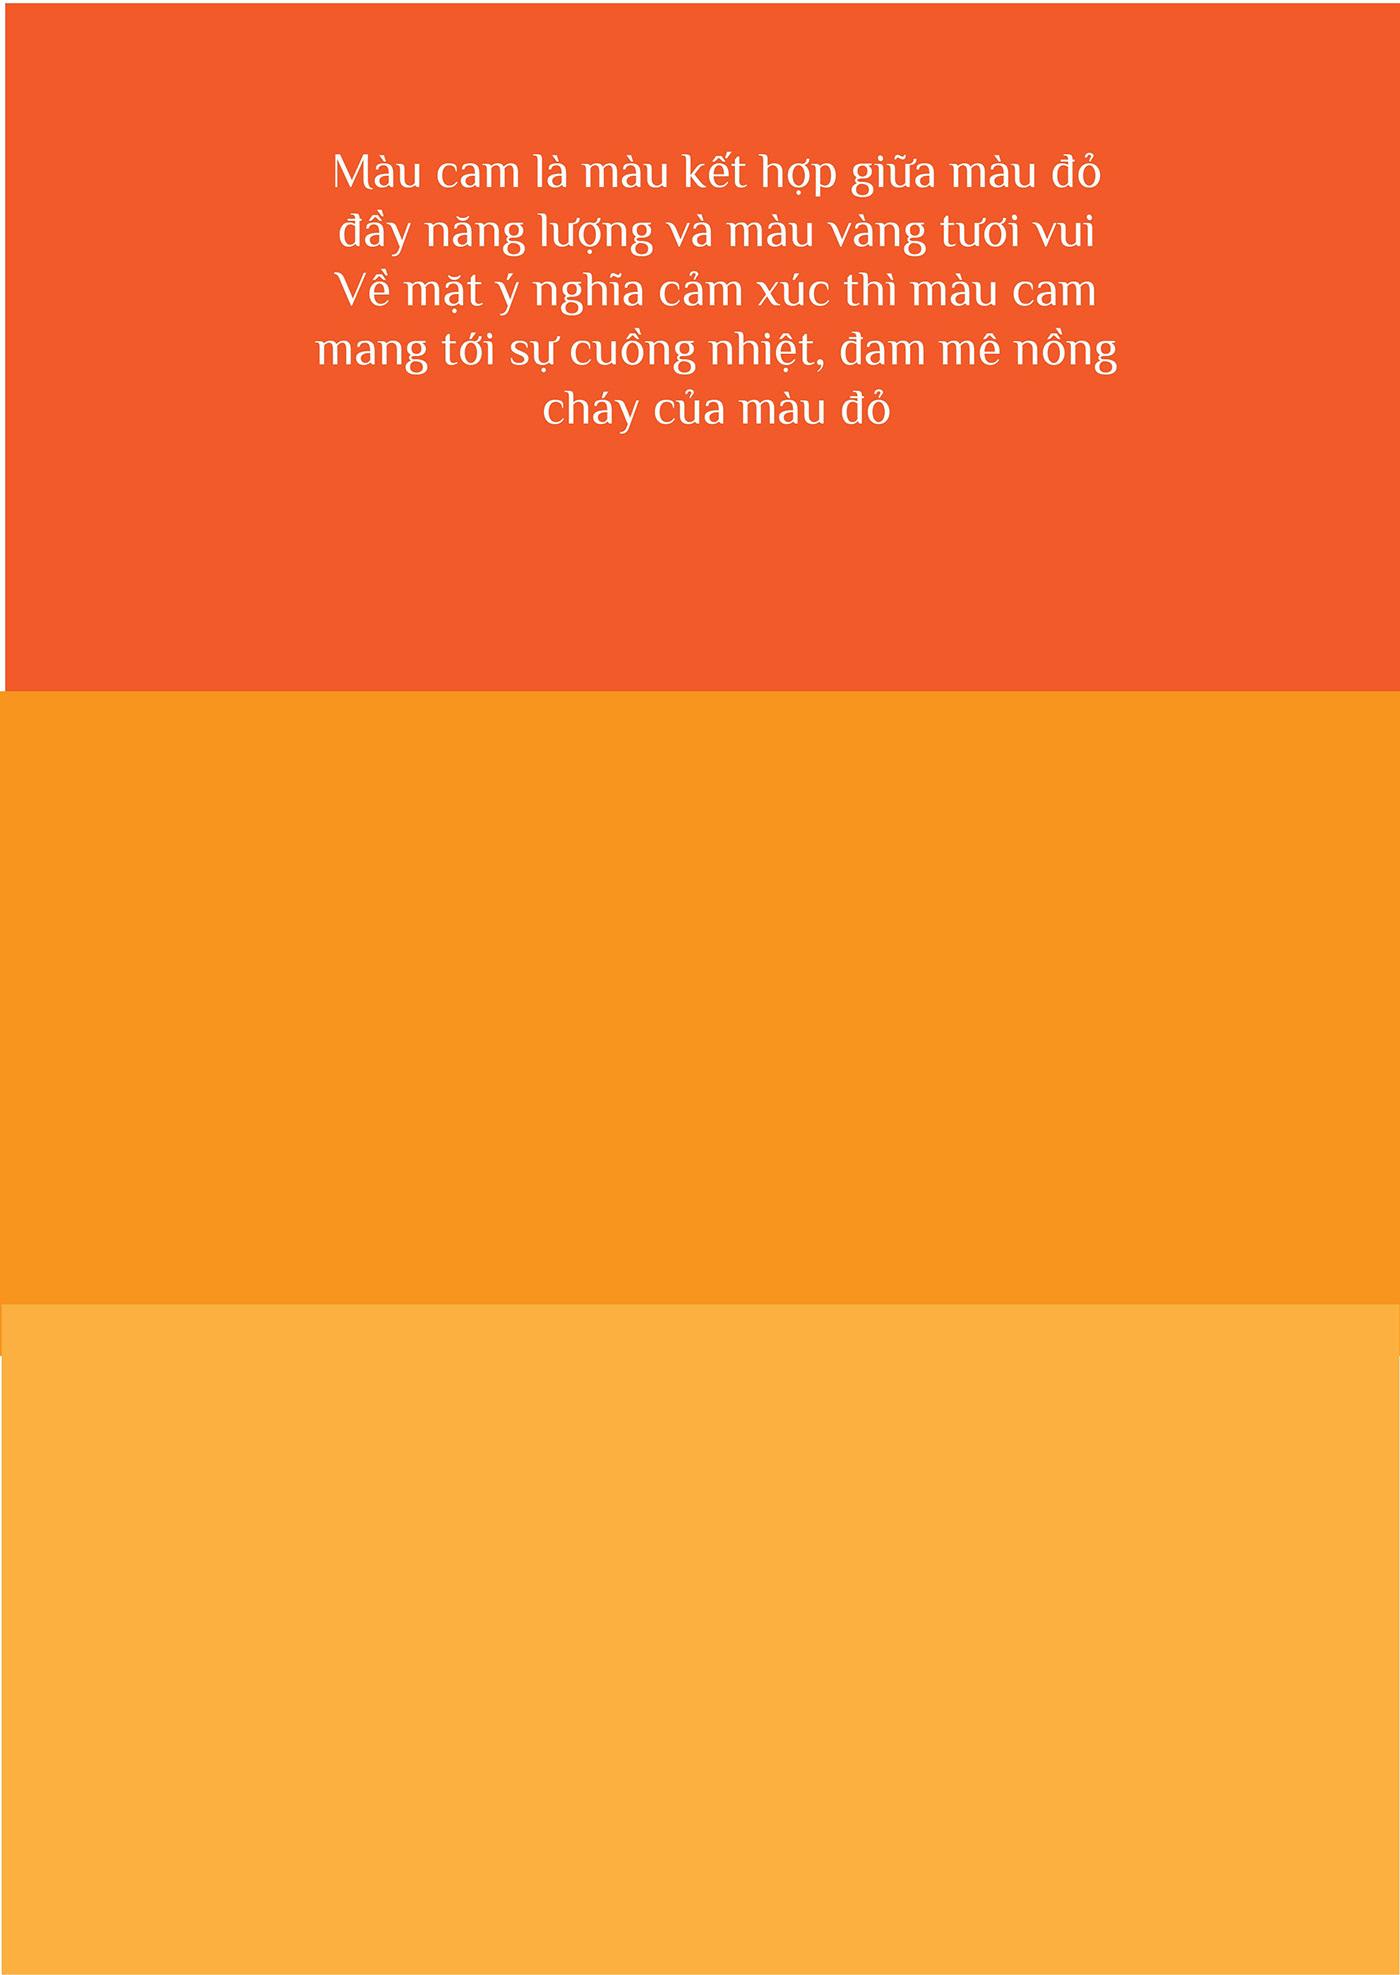 Image may contain: orange, screenshot and abstract